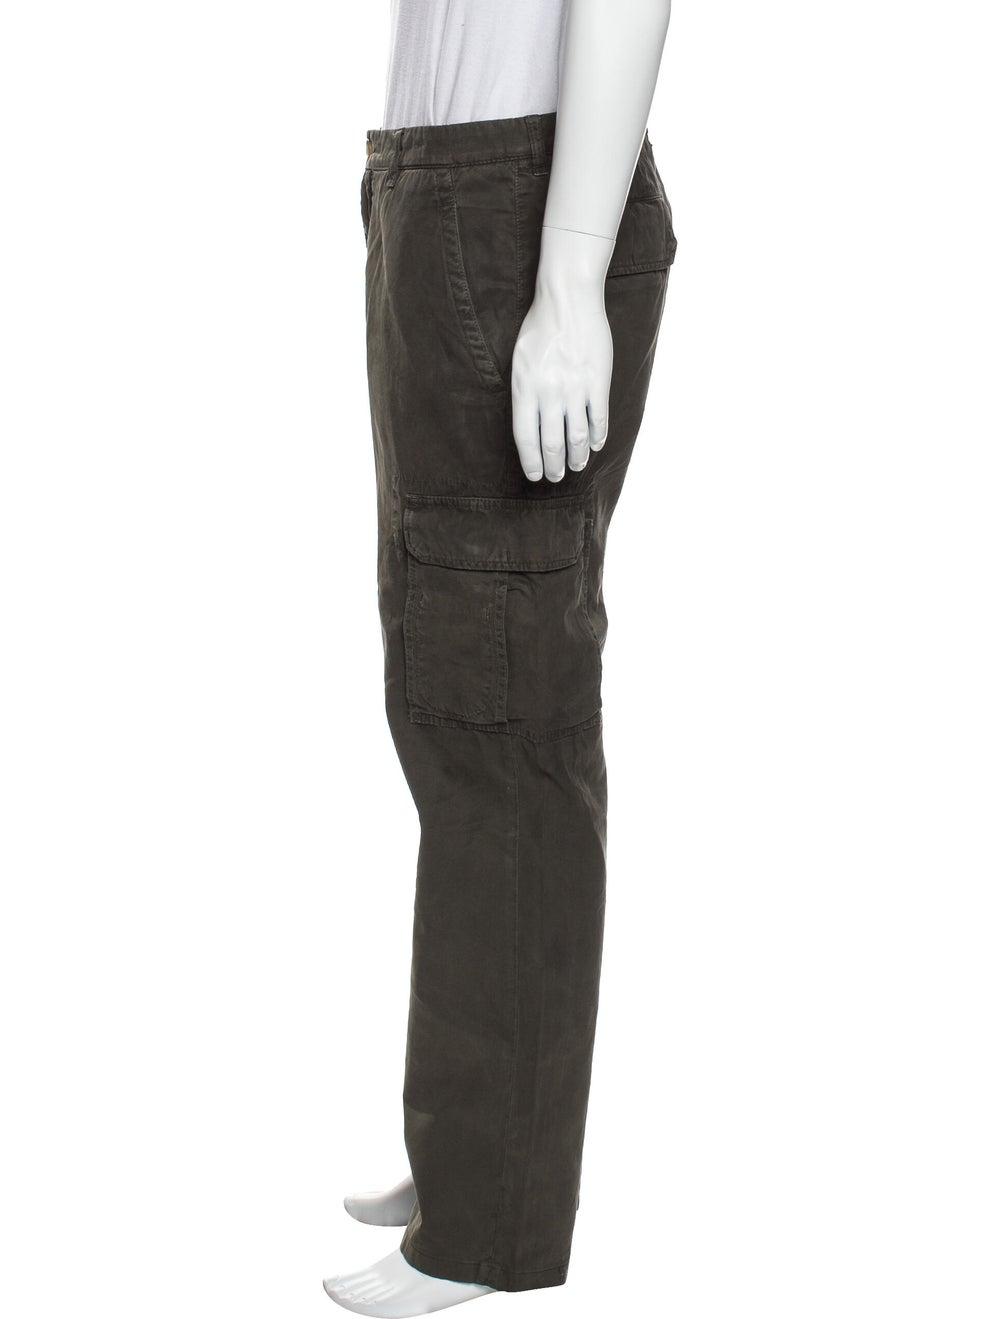 Brunello Cucinelli Cargo Pants Green - image 2